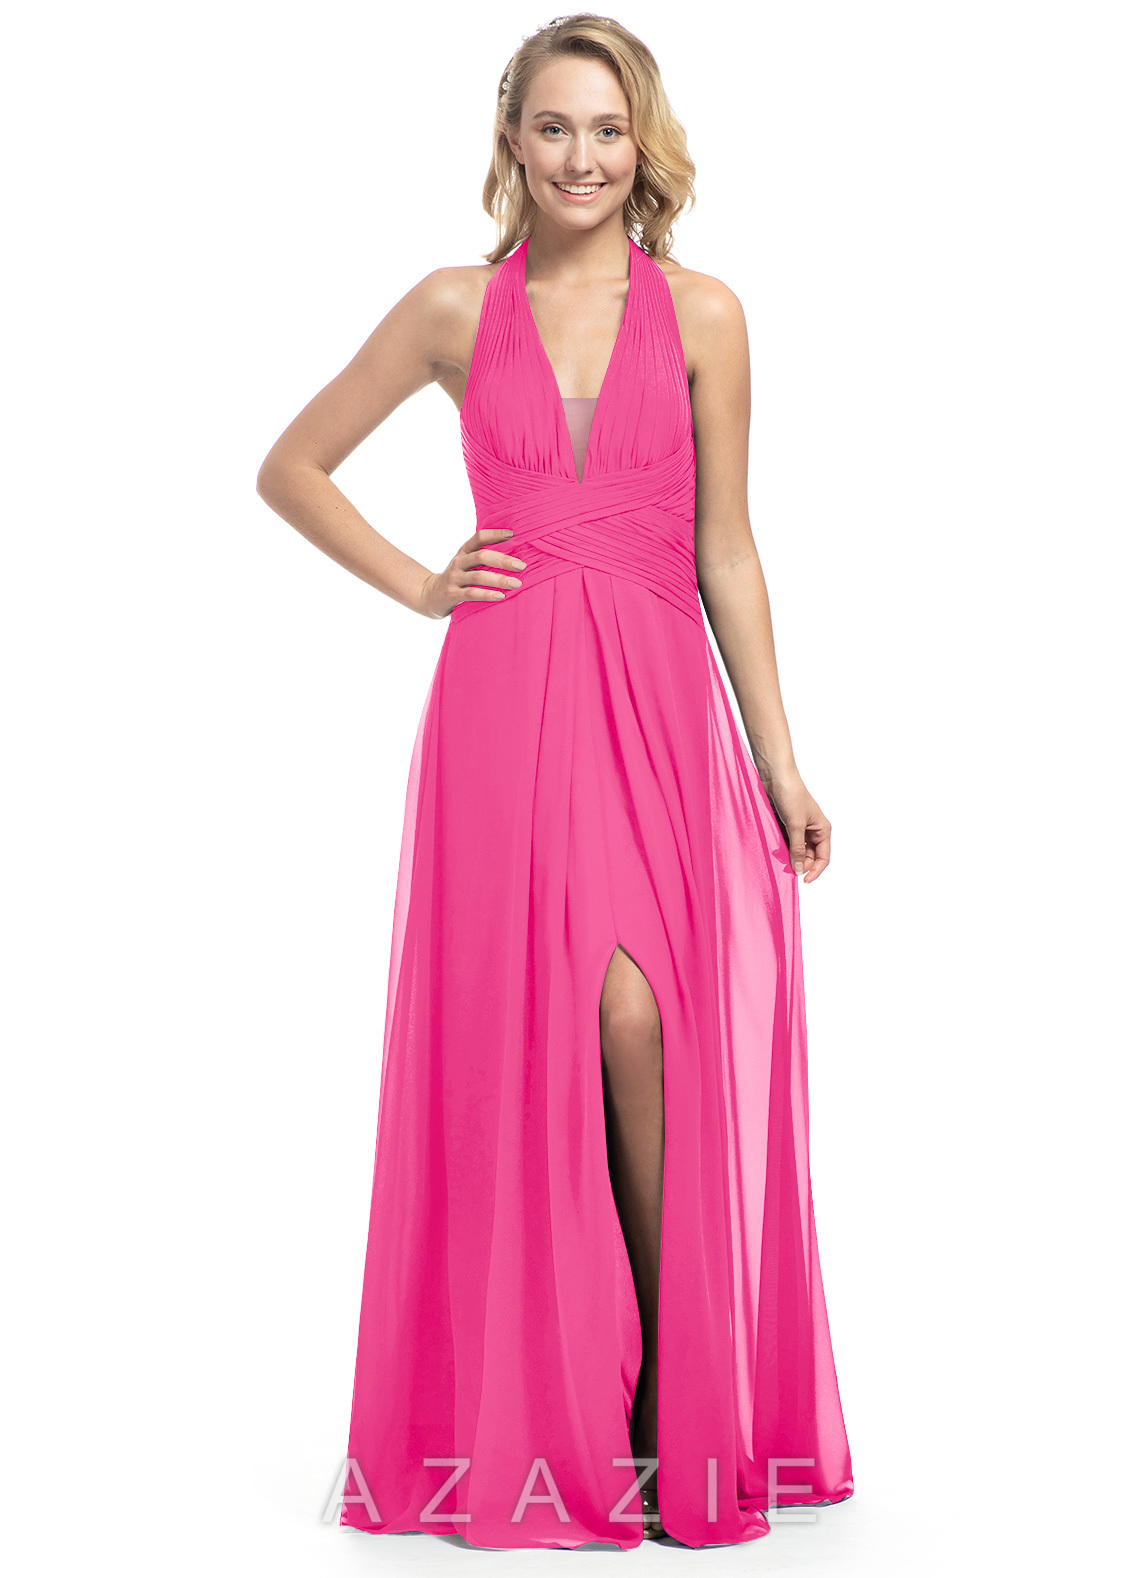 effd1c99072 Azazie Odile Bridesmaid Dress